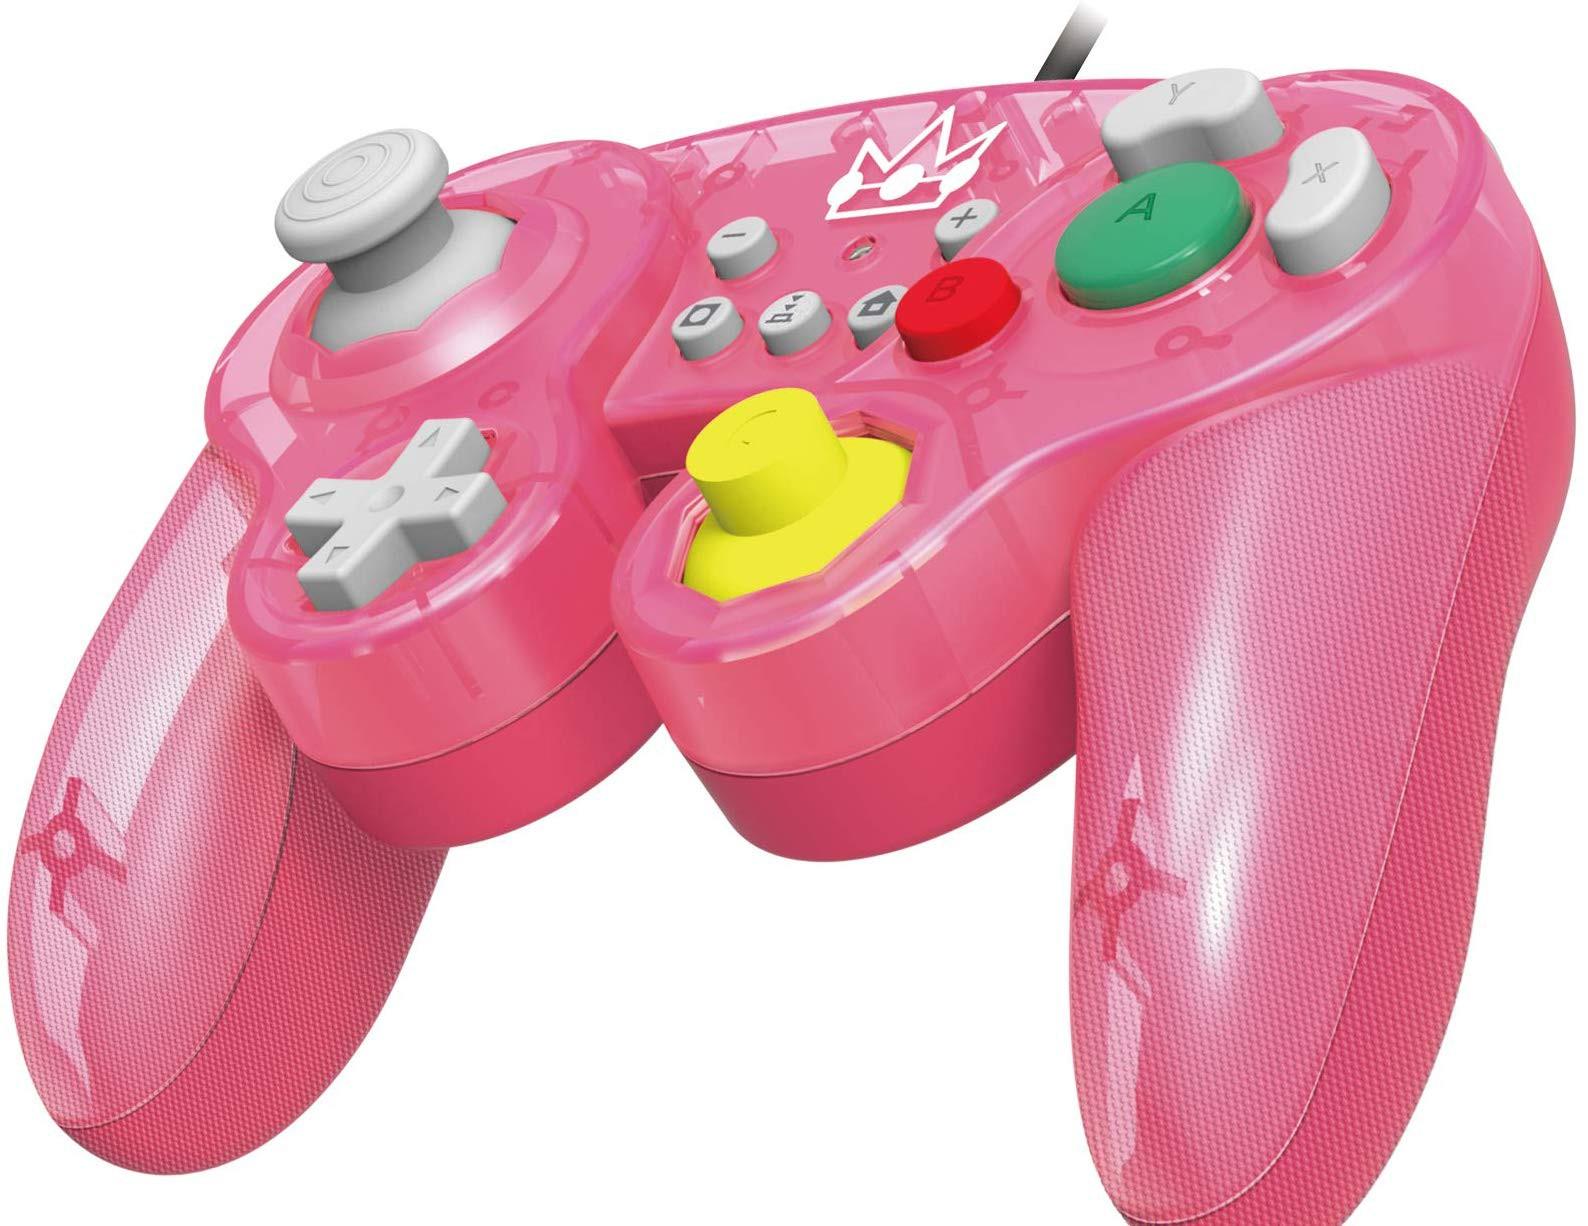 HORI Nintendo Switch Battle Pad (Princess Peach) GameCube Style Controller